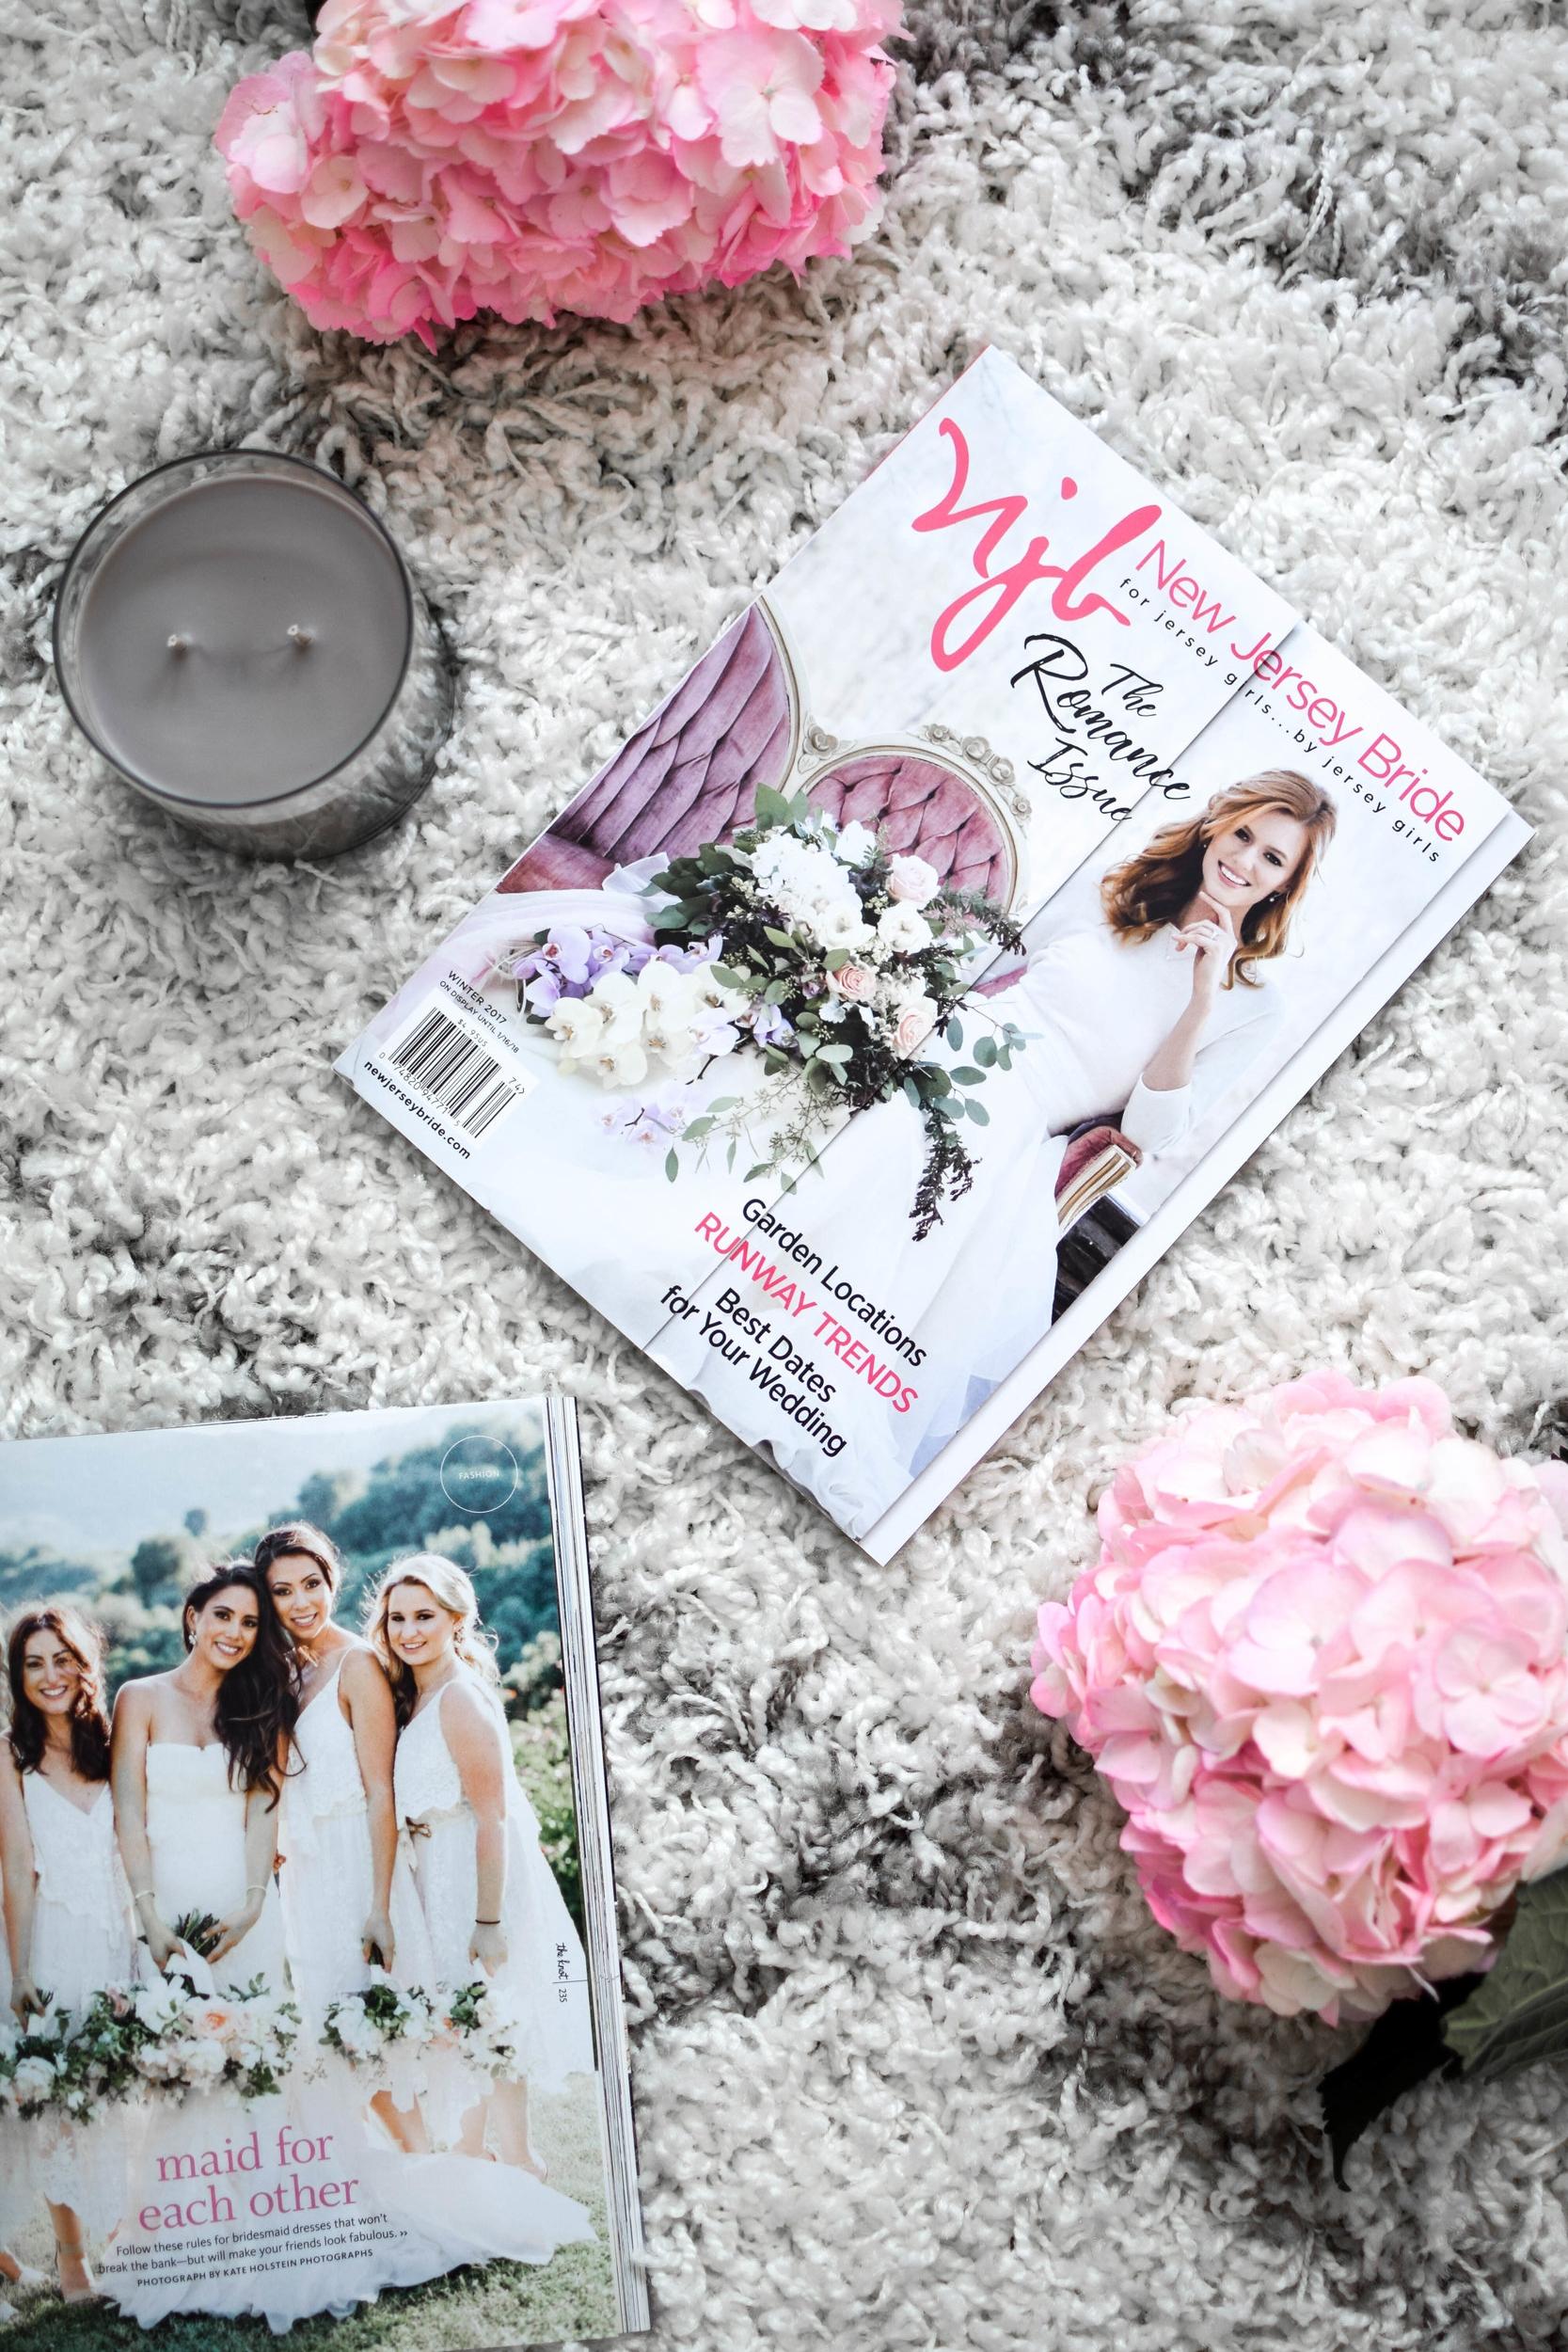 wedding planning tips / wedding planning / New Jersey bride / wedding inspiration